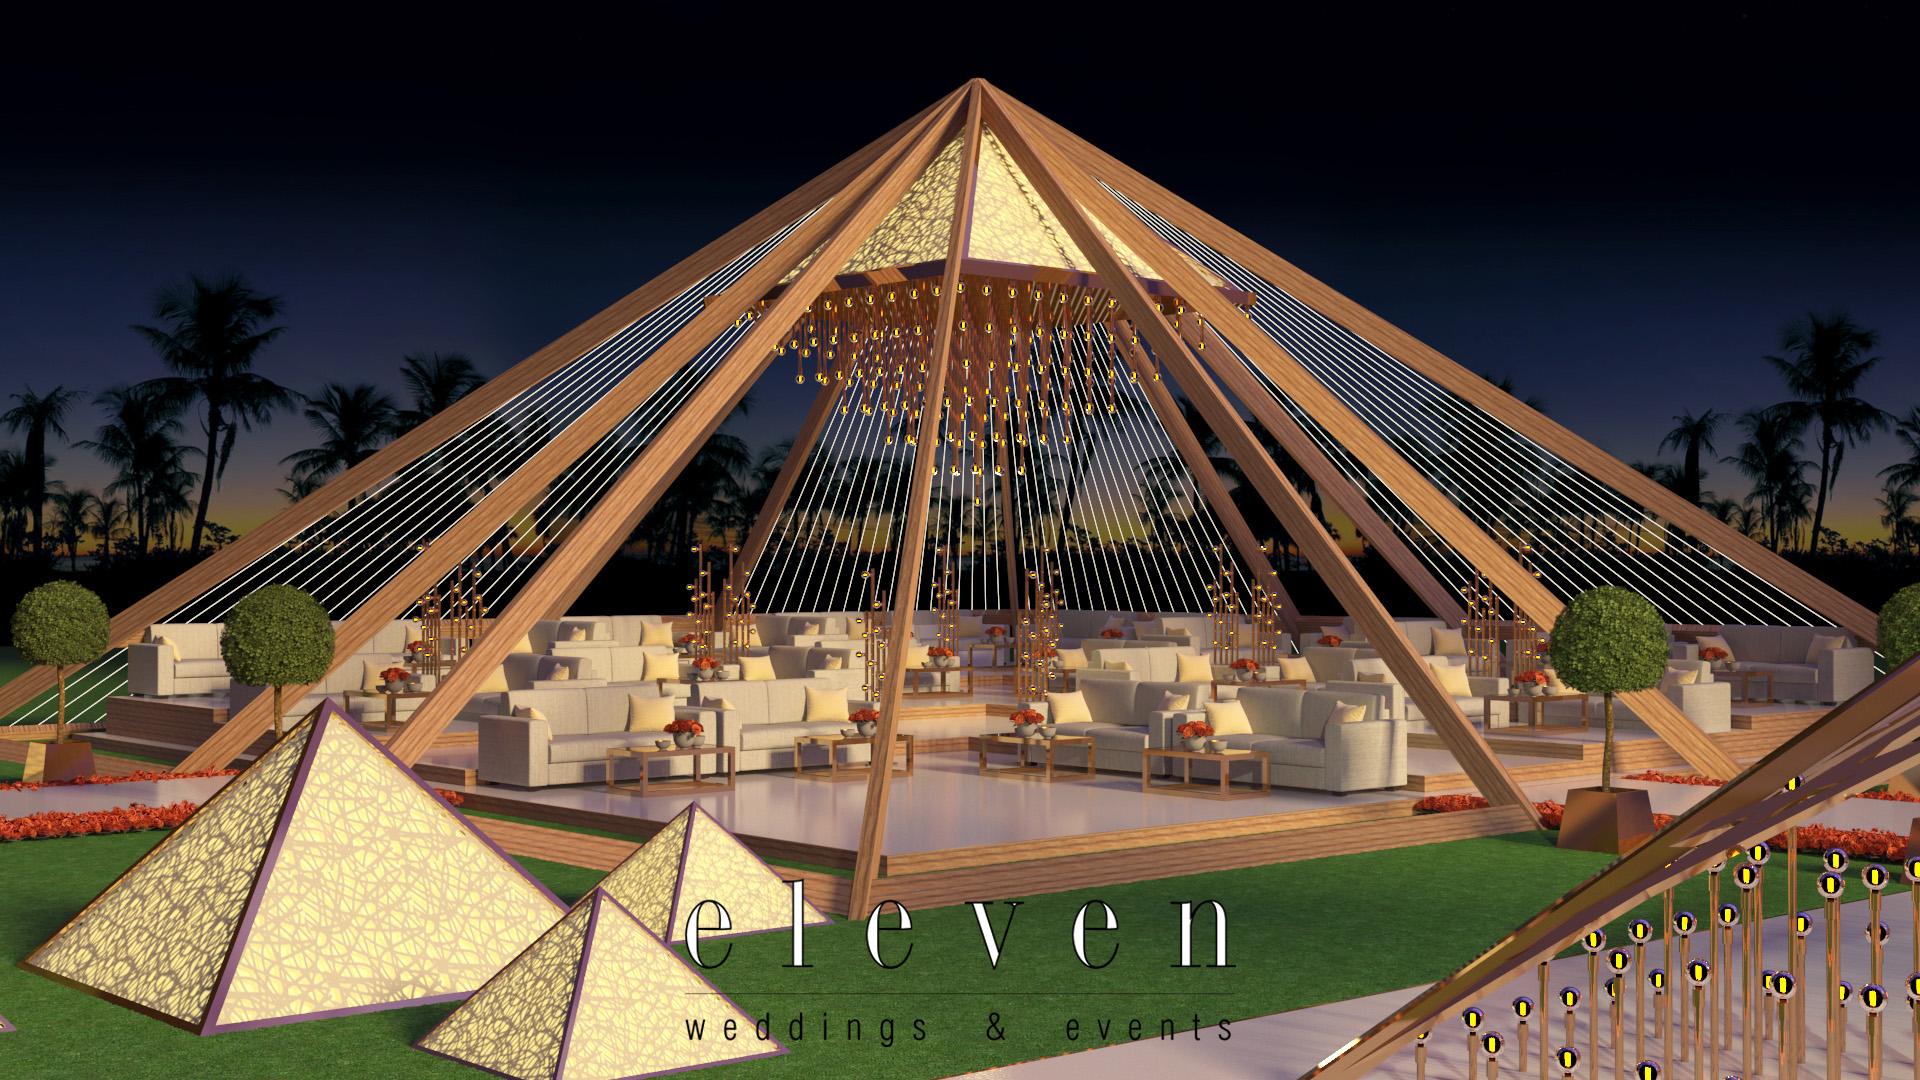 Pyramid2_2a_Logo_R.jpg